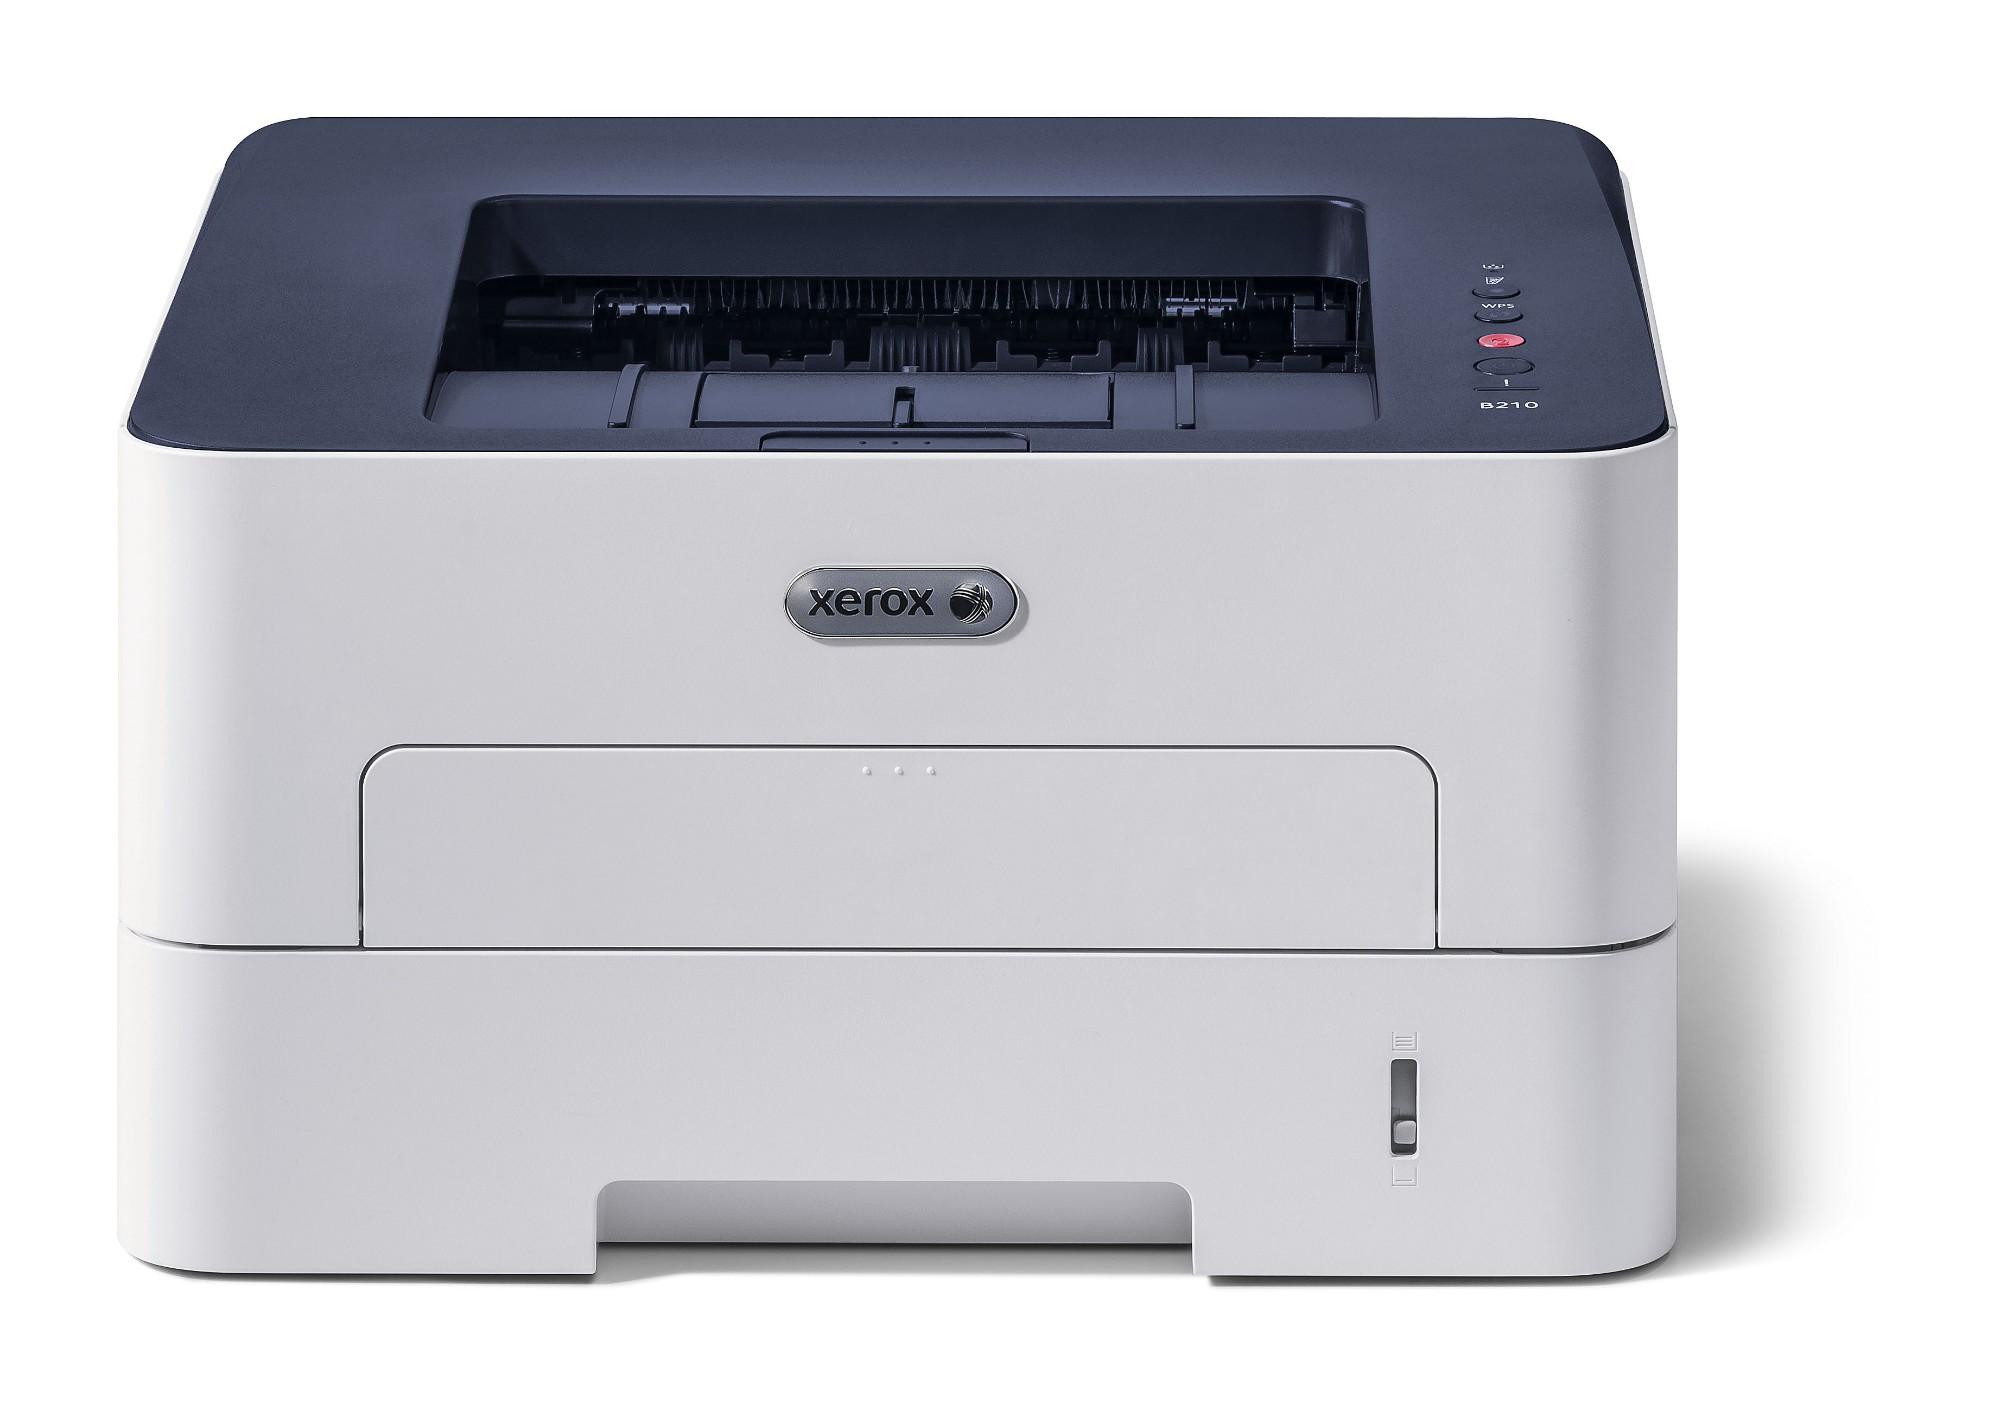 Xerox B210 A4 30ppm Impresora inalámbrica doble cara PS3 PCL5e/6 2 bandejas Total 251 hojas